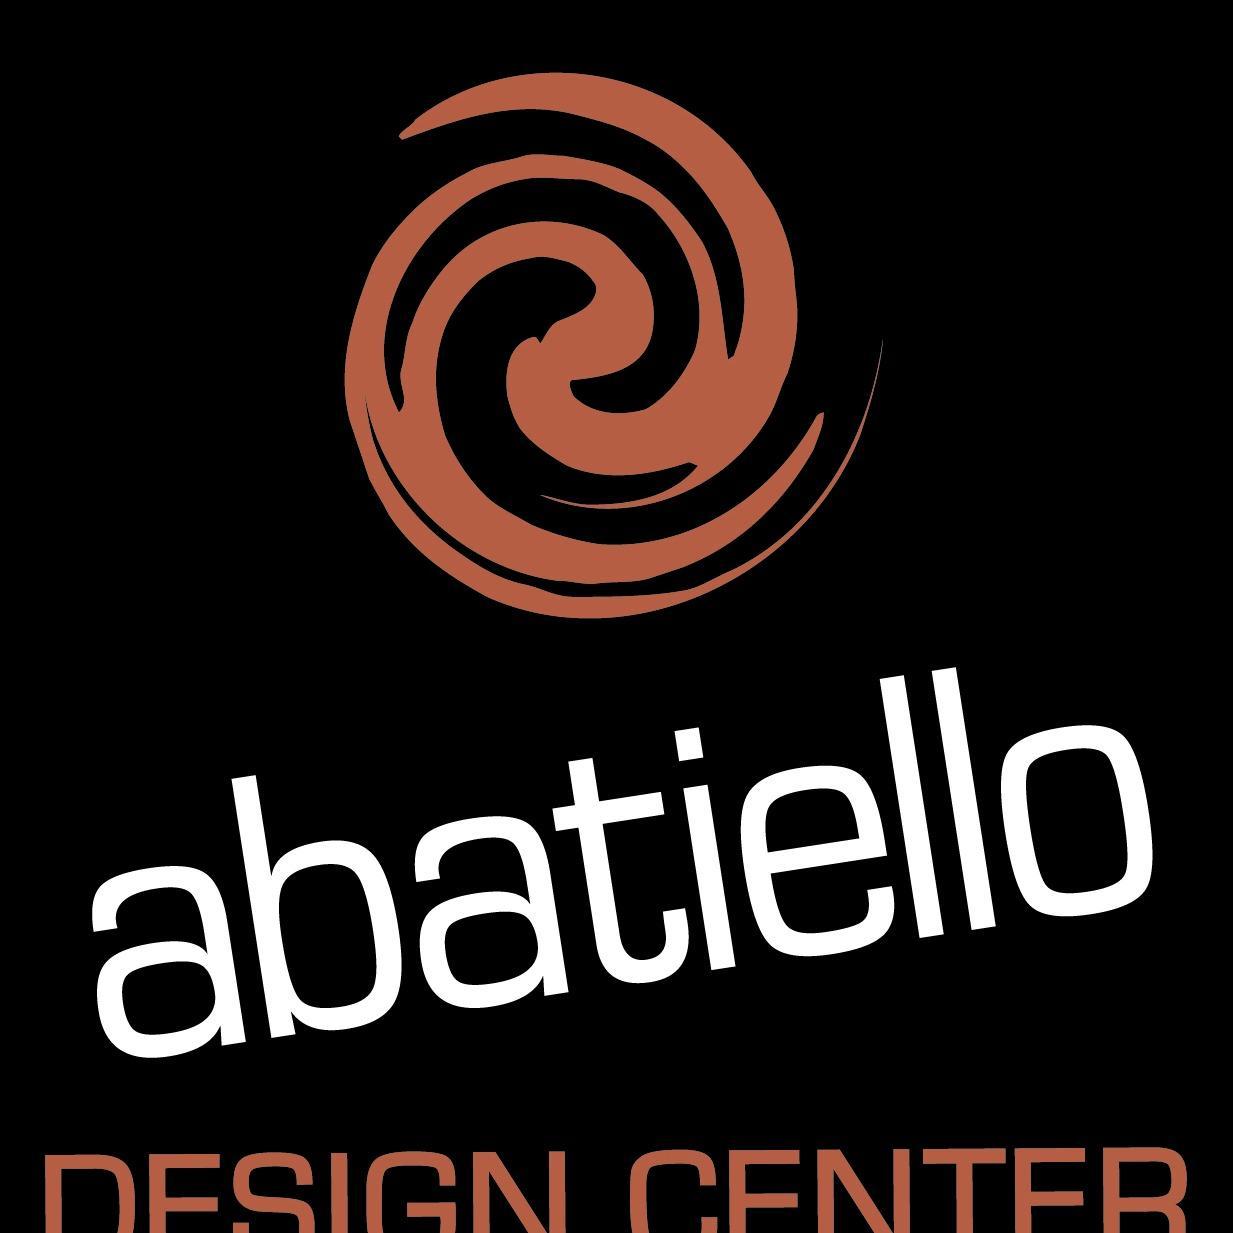 Abatiello Design Center - Rutland, VT - Carpet & Floor Coverings